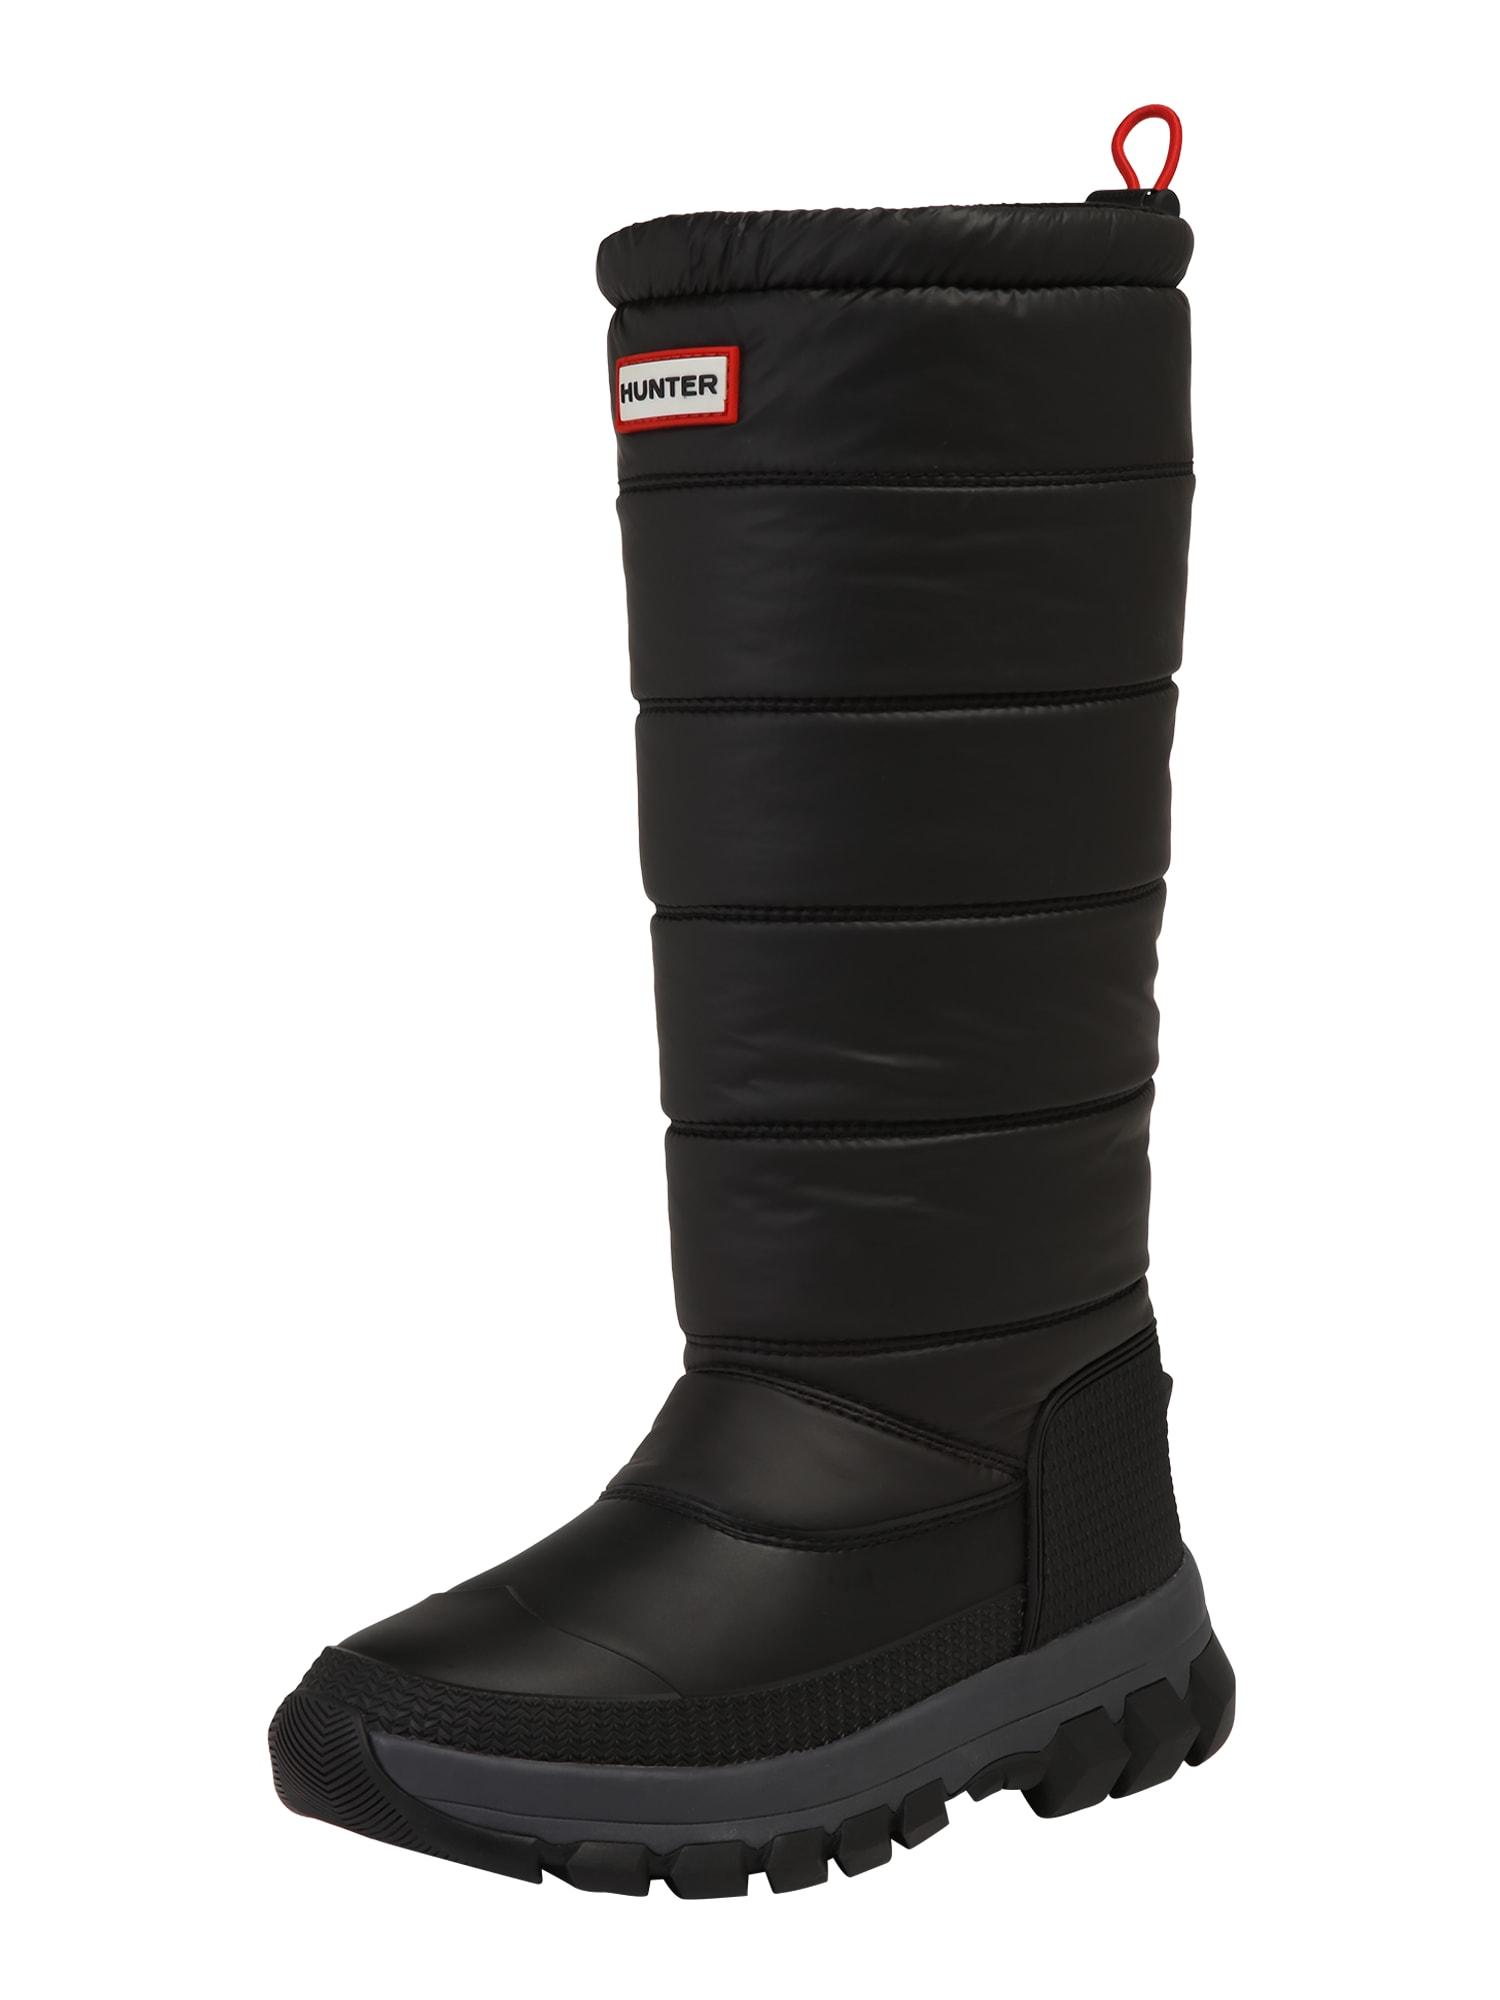 Stiefel 'WOMENS ORIGINAL INSULATED SNOW BOOT TALL' | Schuhe > Boots > Snowboots | Hunter